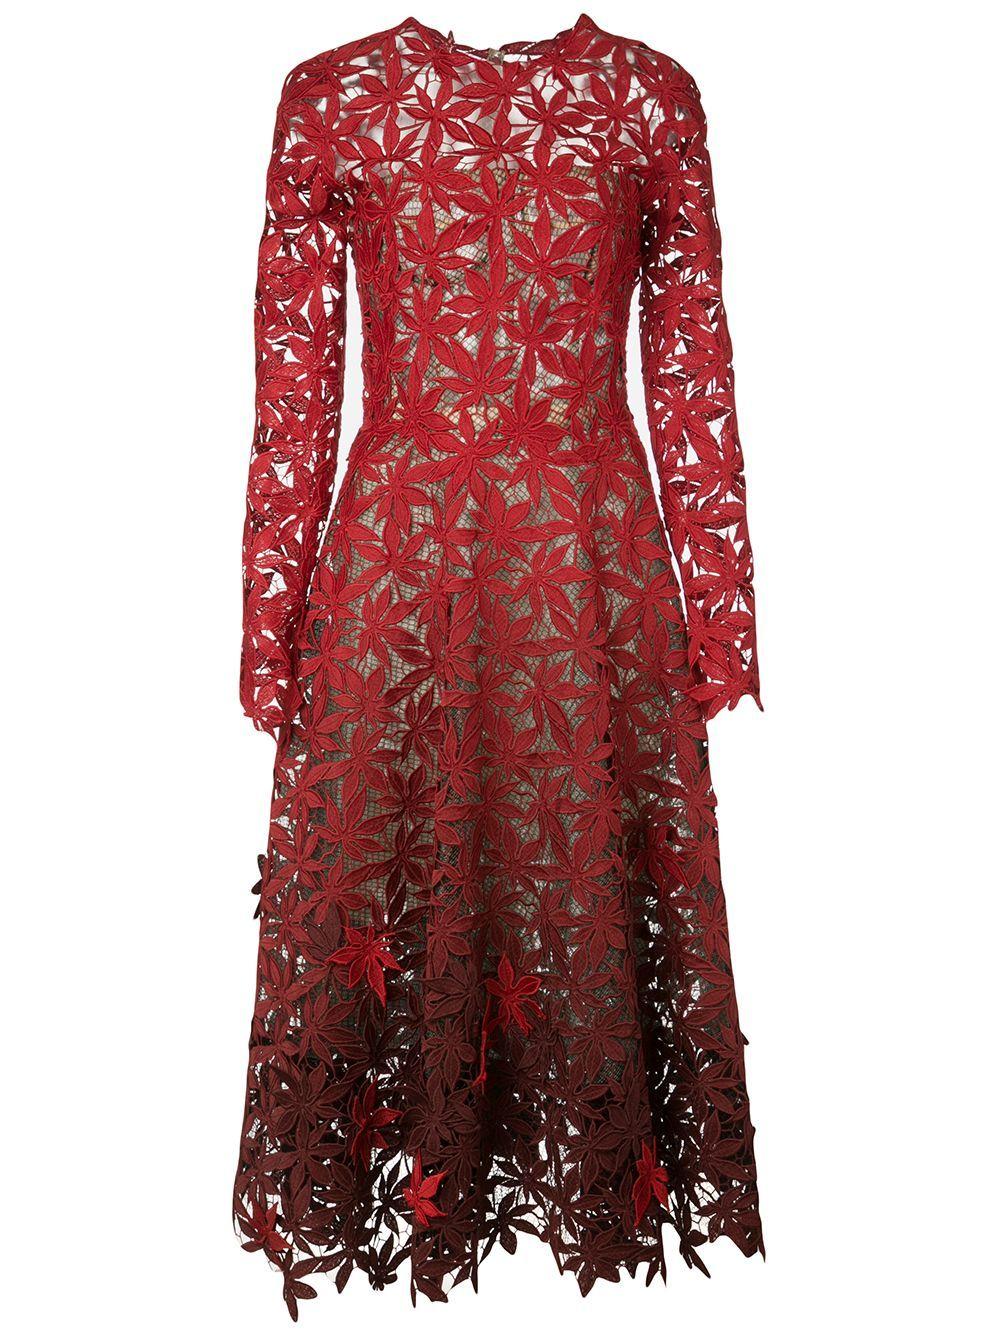 Oscar De La Renta Degrade Cocktail Dress Red In 2020 Dresses Crochet Midi Dress Red Midi Dress